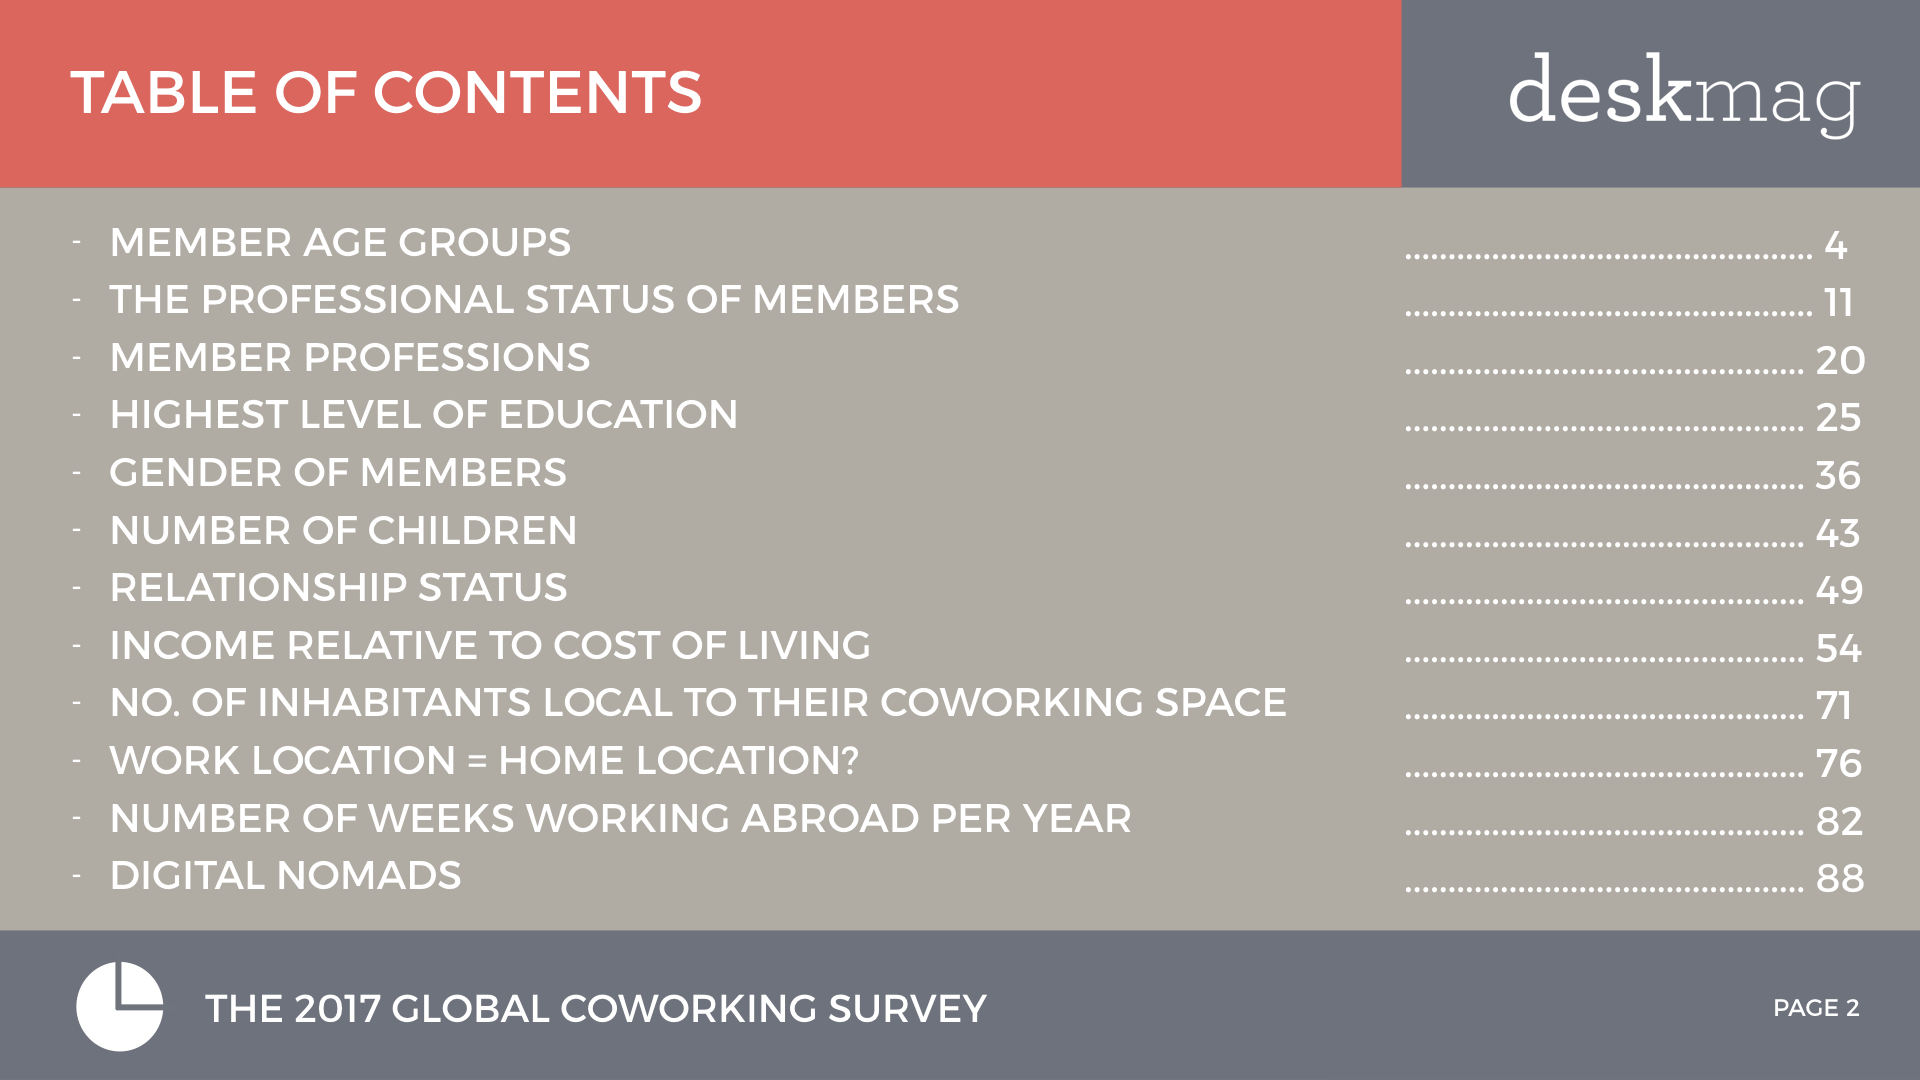 Members Of Coworking Spaces - Global Coworking Survey 2017 All Slides DEMOGRAPHICS.002.jpeg